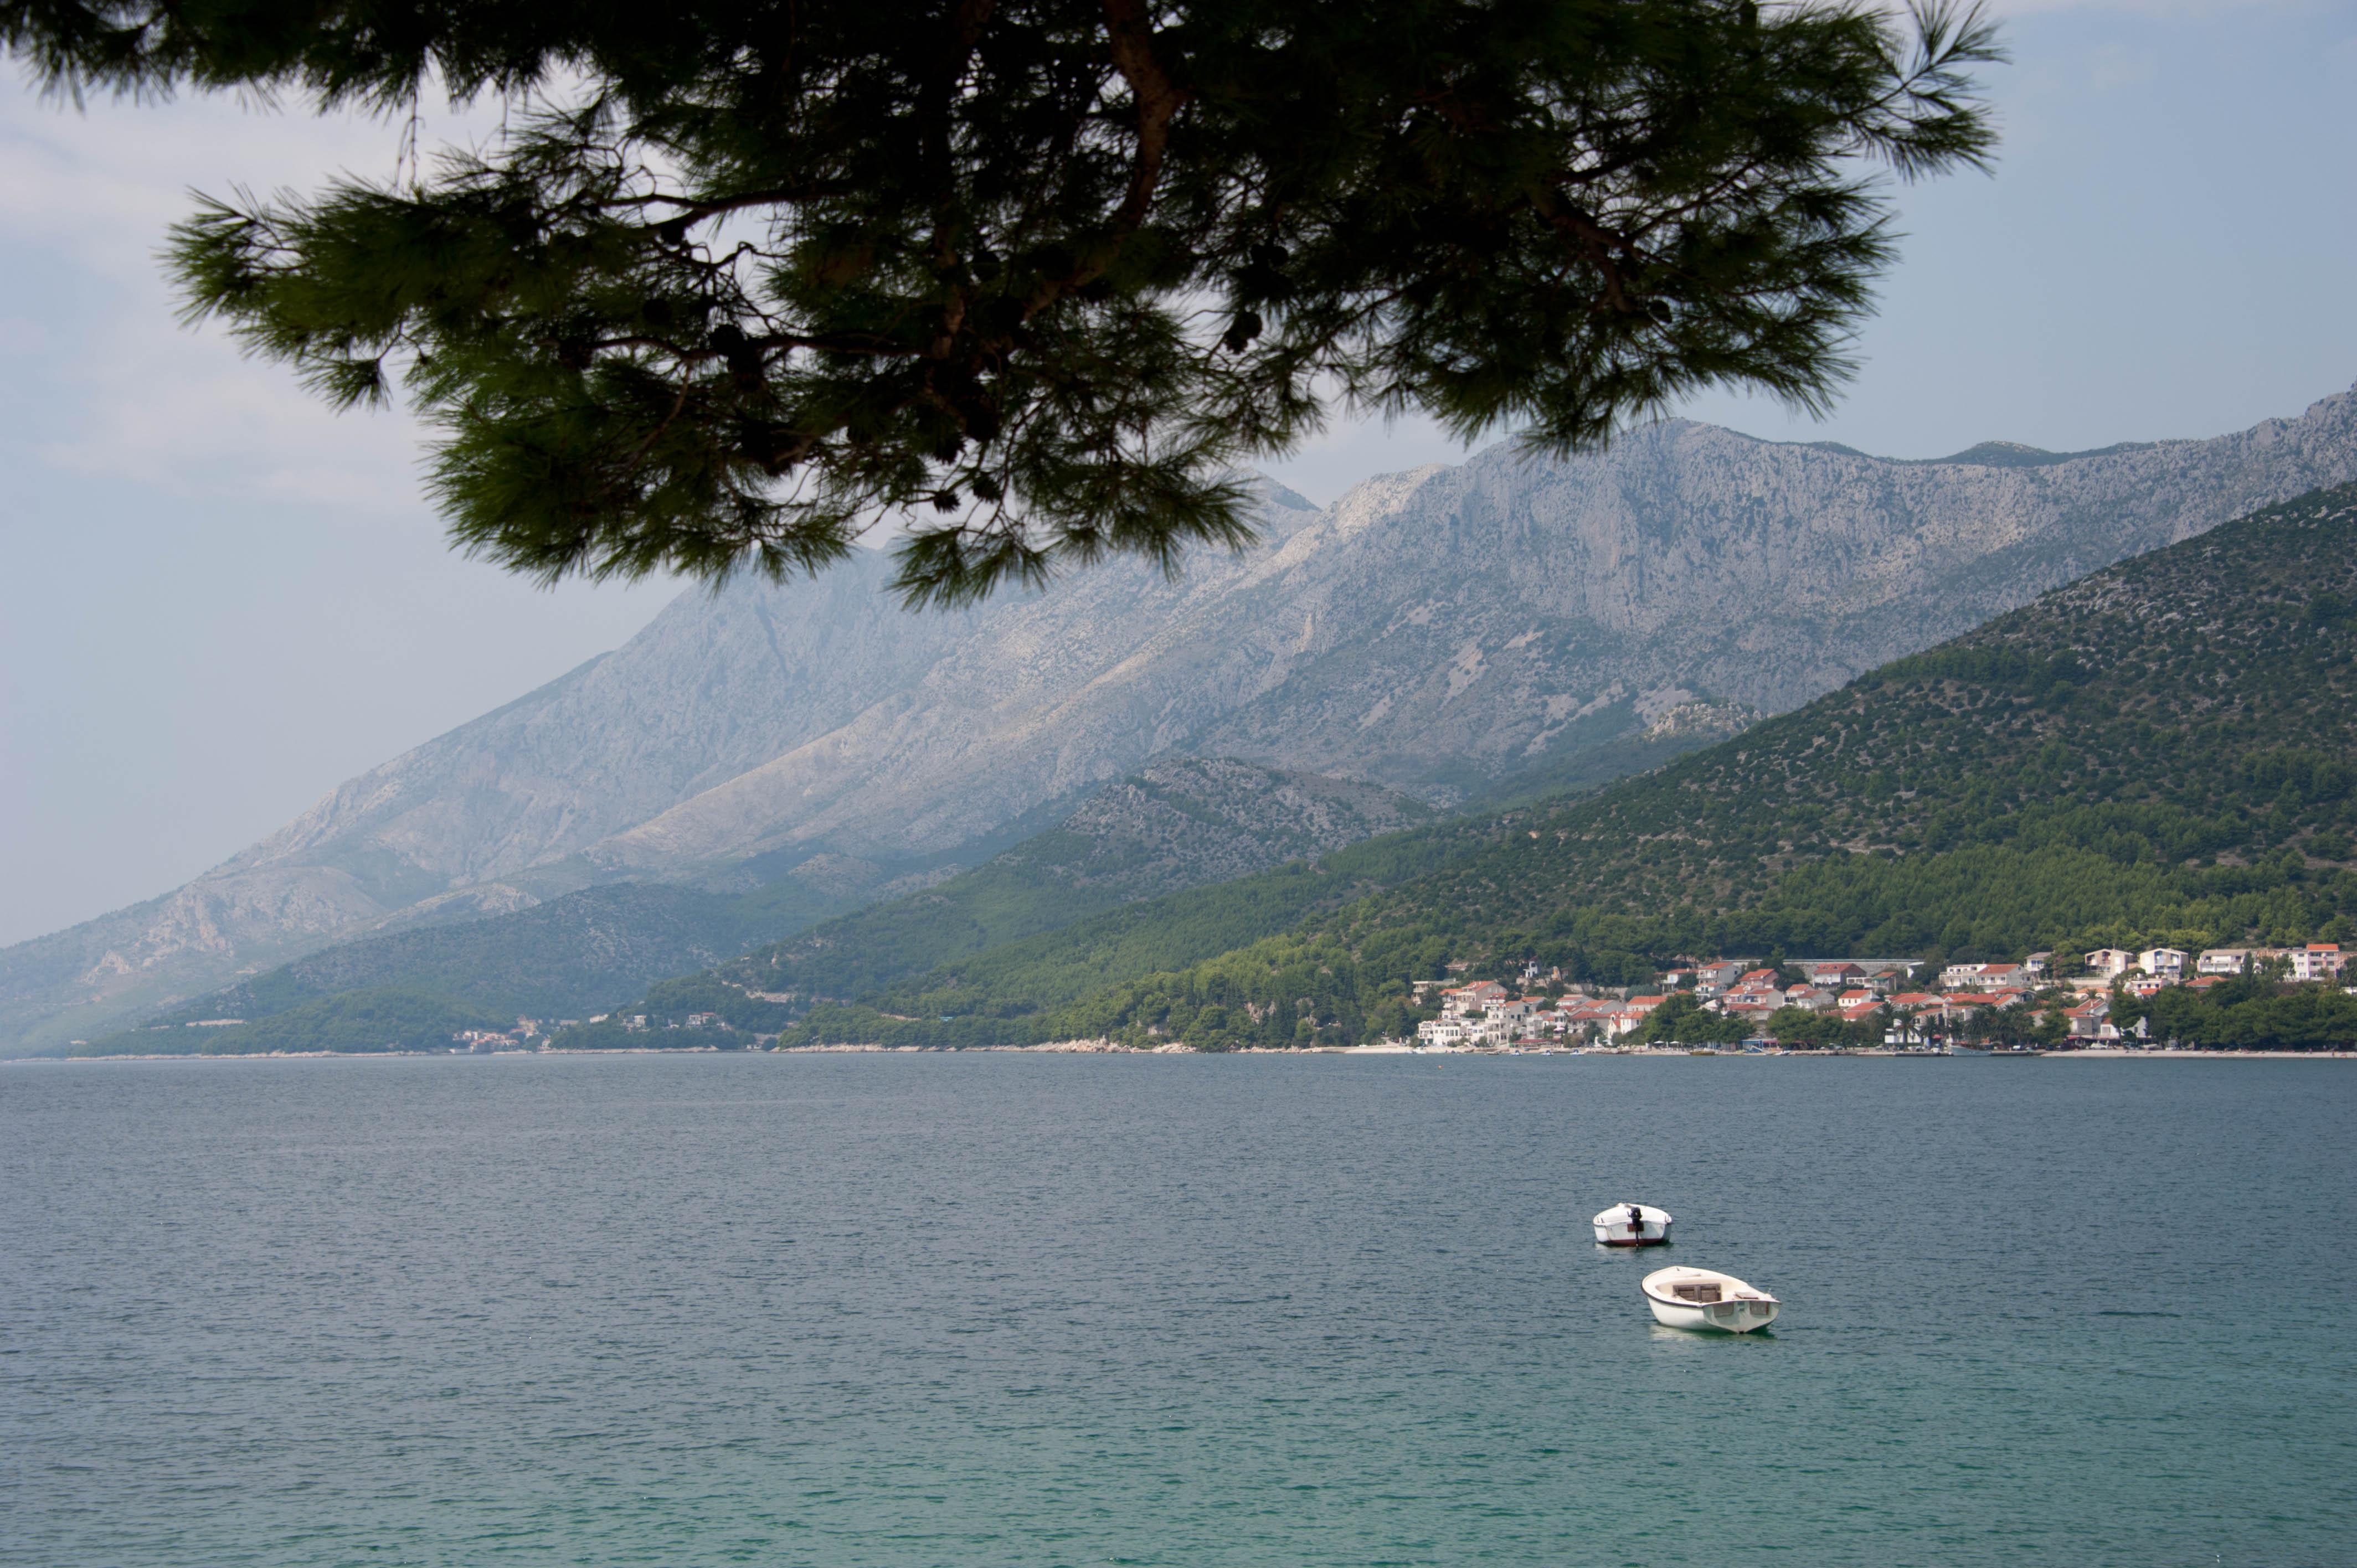 0302-Zaotrog (Dalmatie centrale)